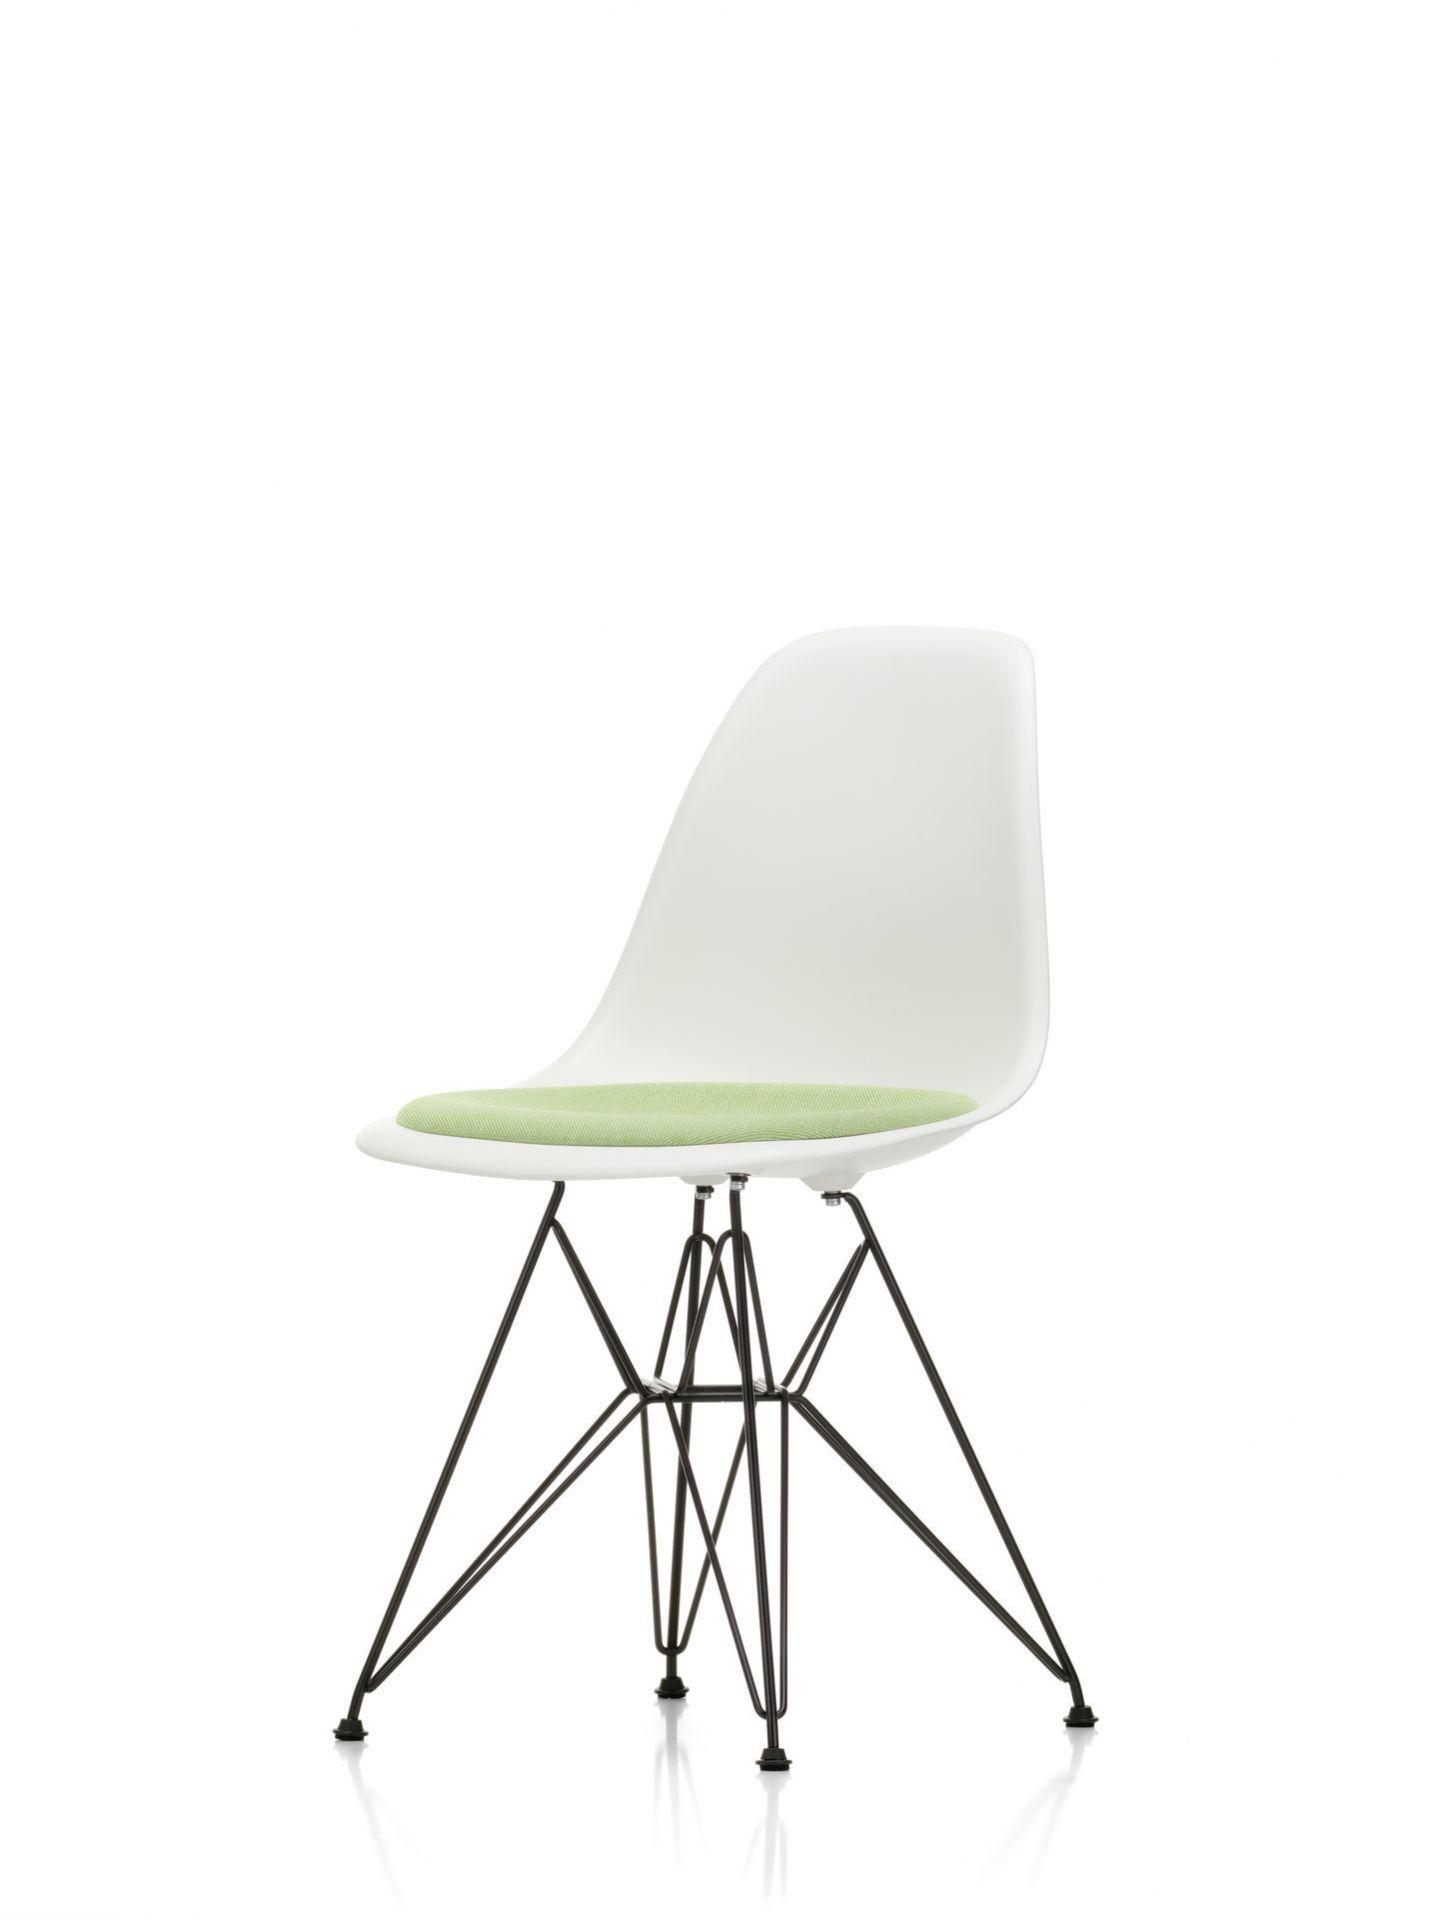 Eames Plastic Side Chair DSR Stuhl mit Sitzpolster Vitra